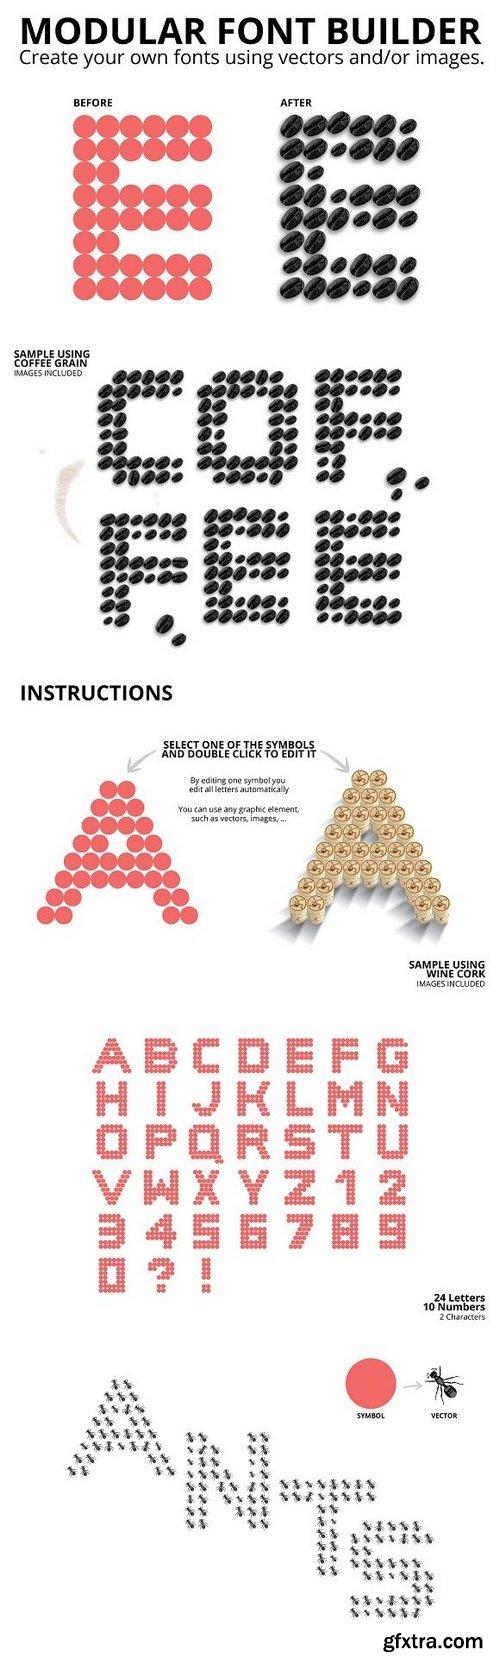 CM - Modular Font Builder 1264922